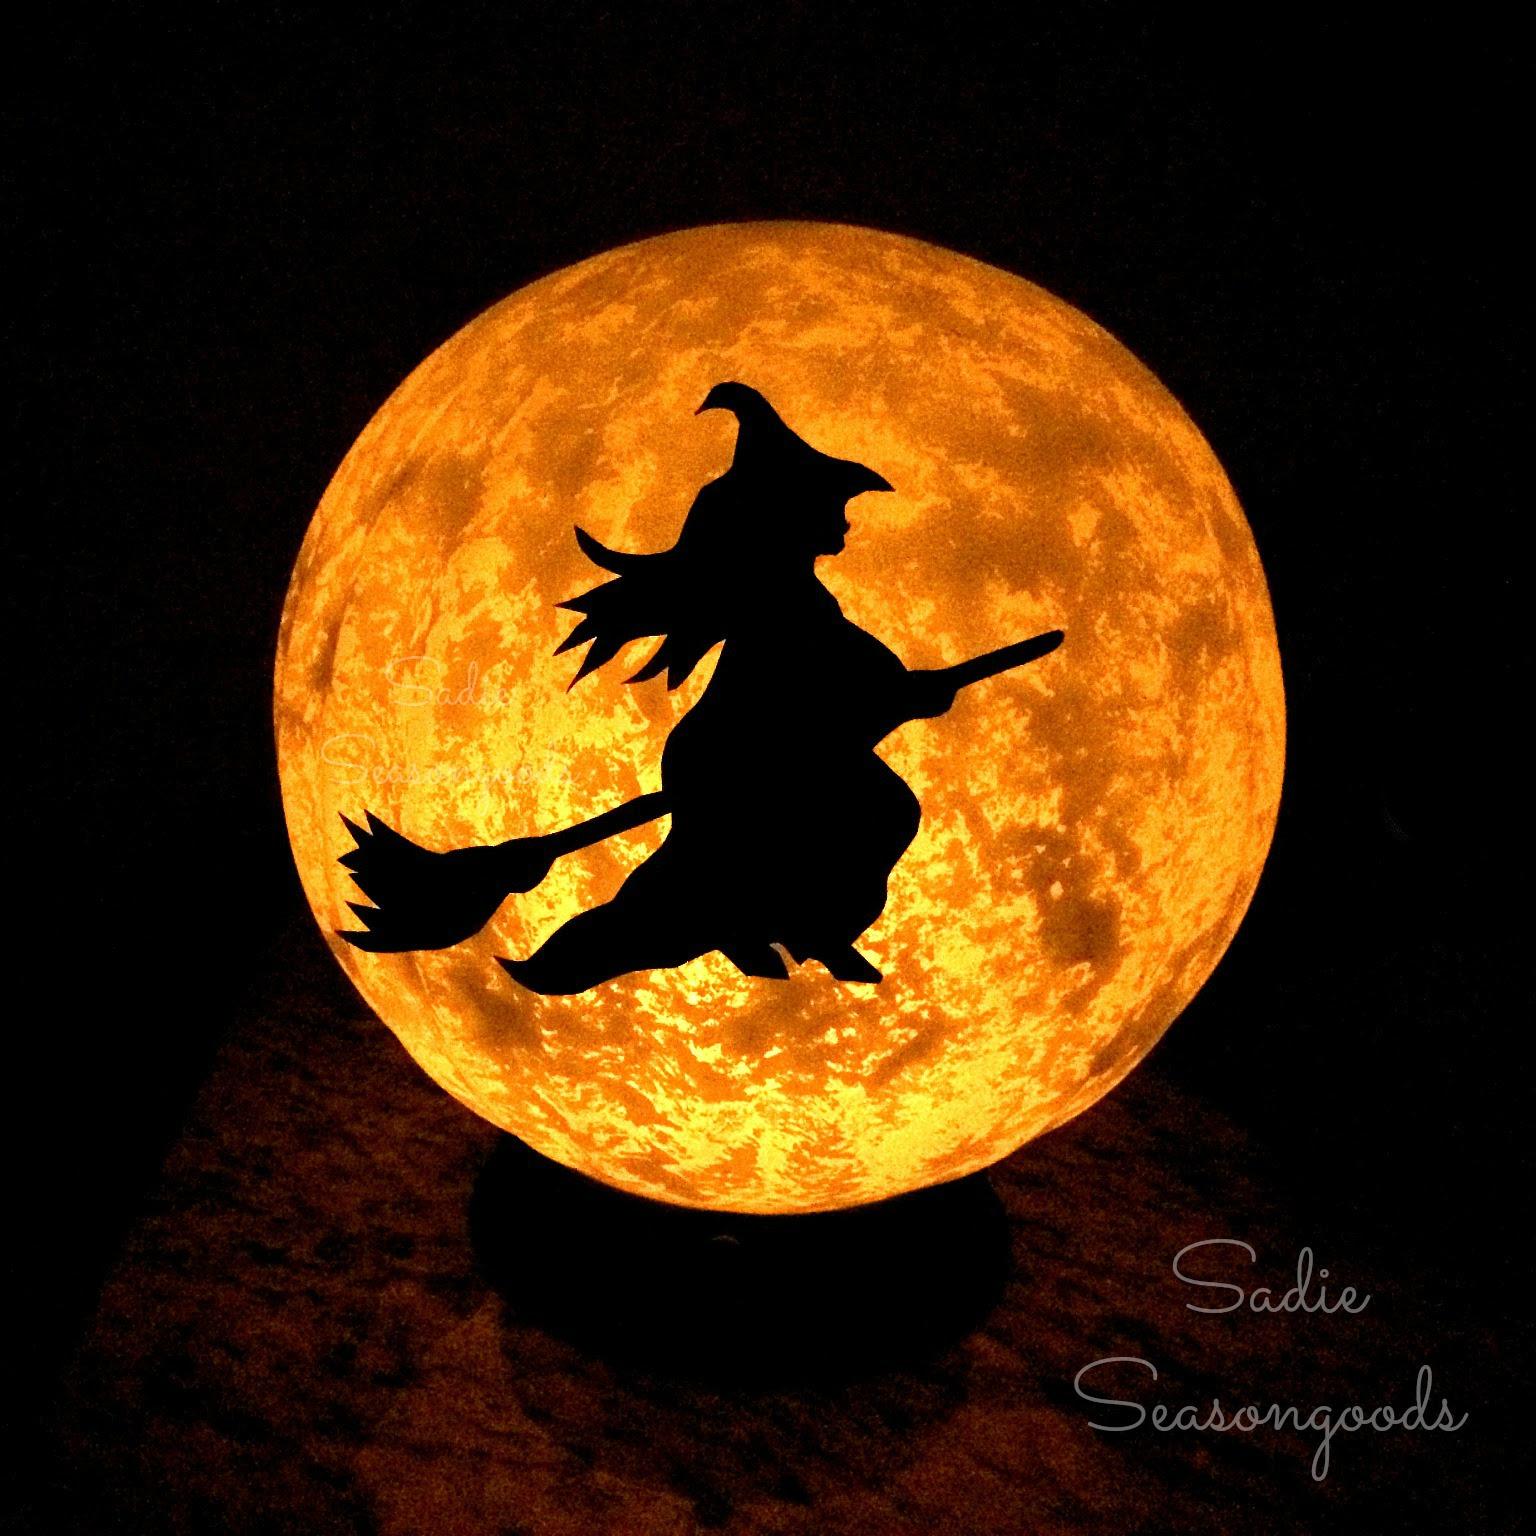 Vintage Light Fixture Halloween Moon - Sadie Seasongoods